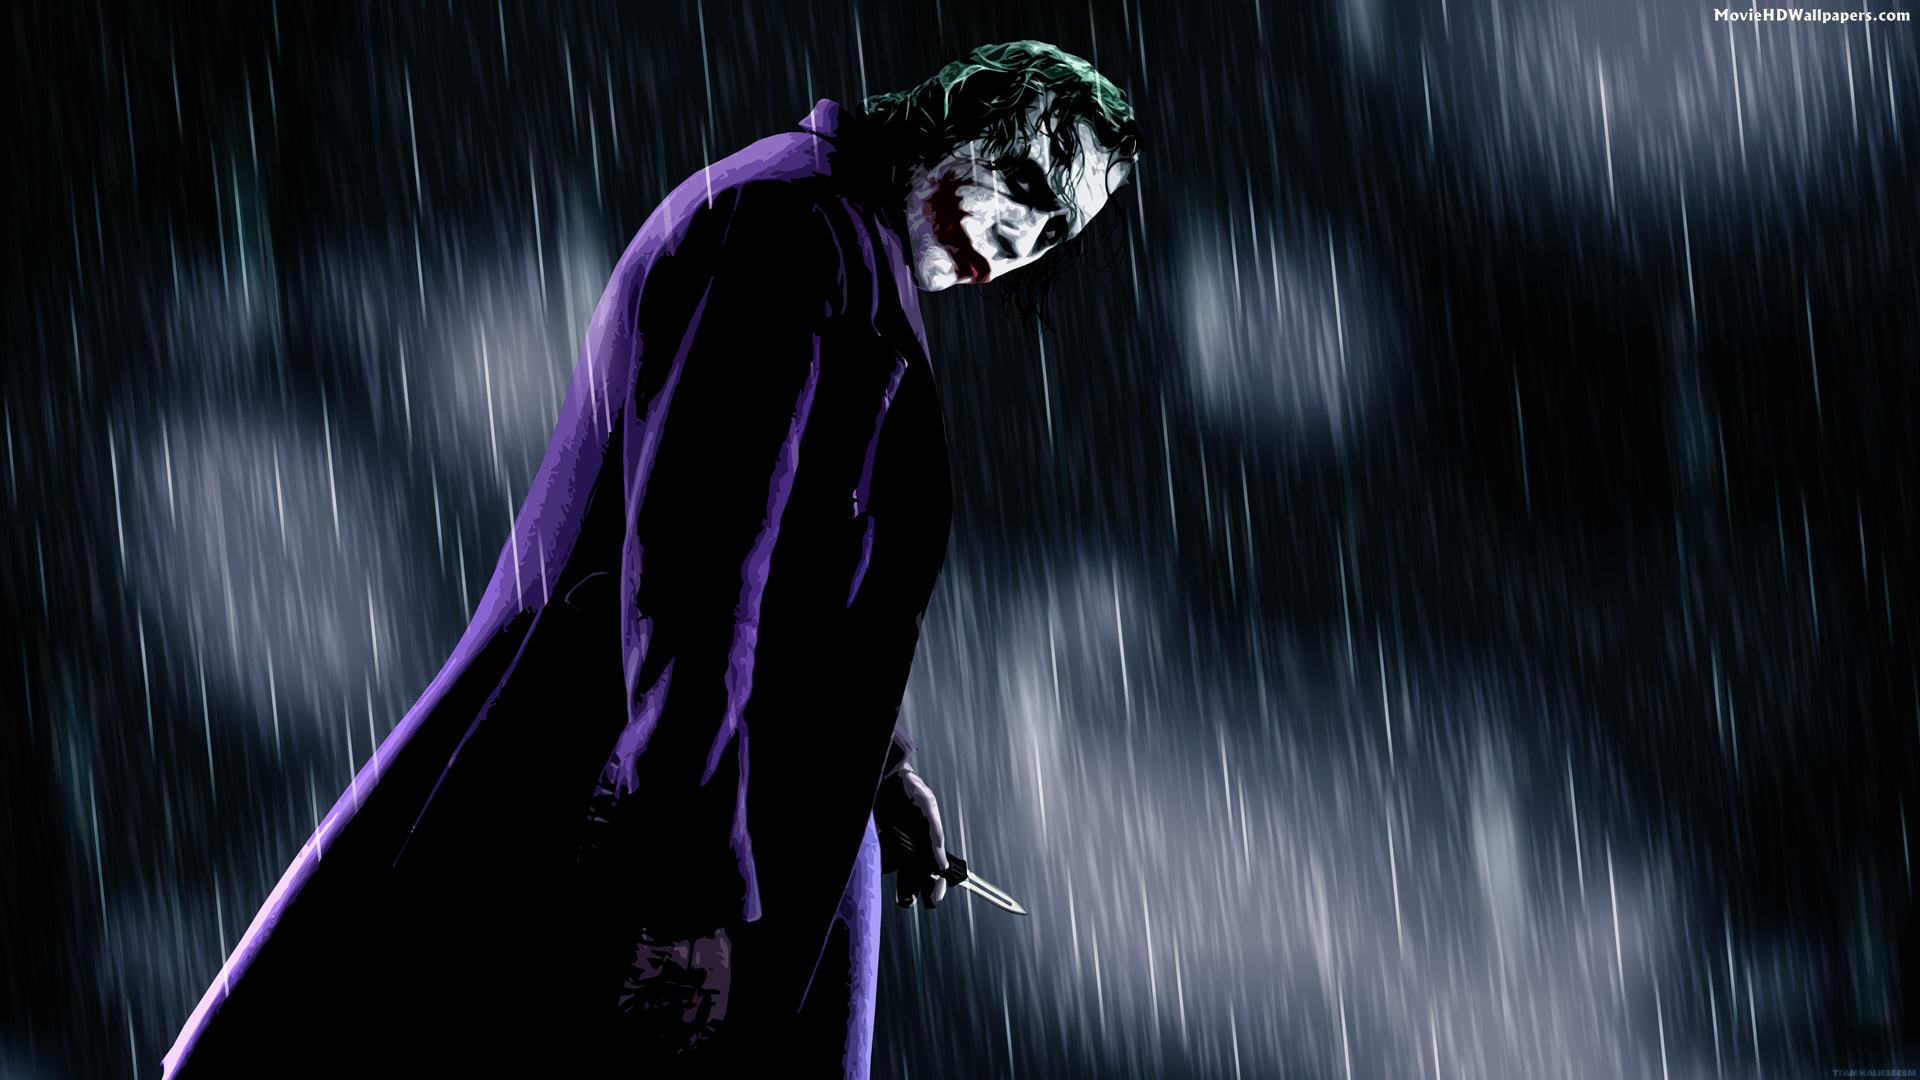 The Joker HD Wallpaper